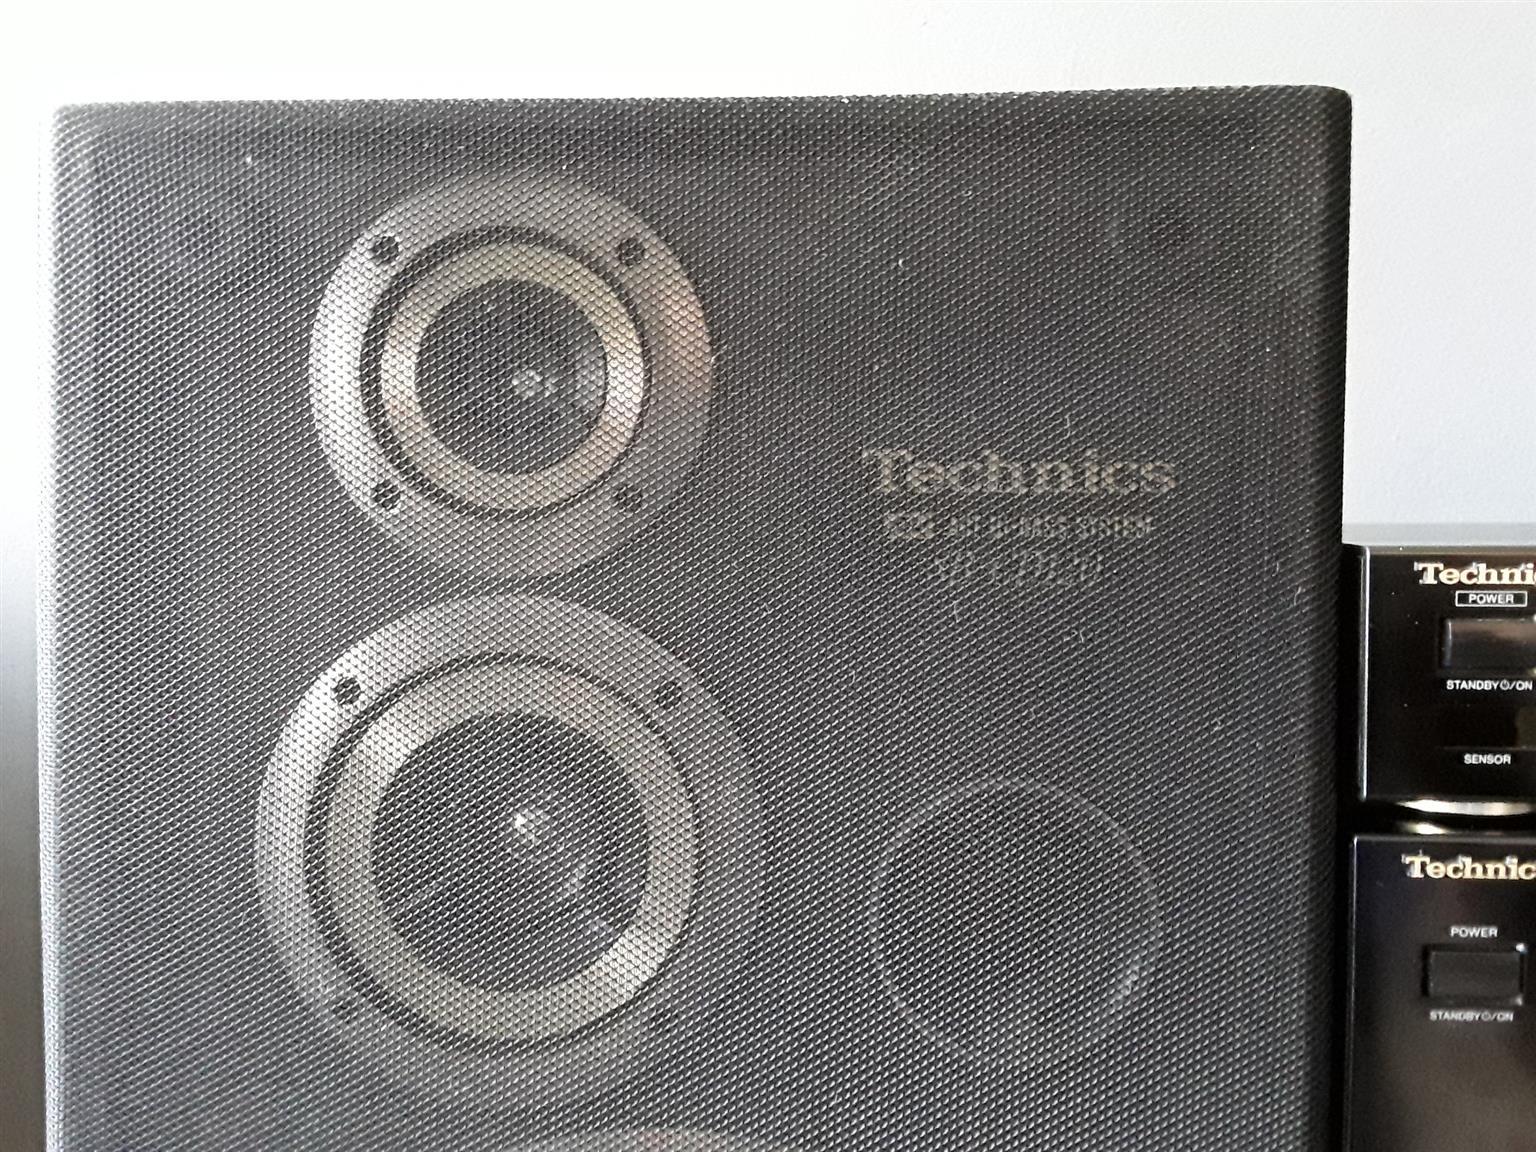 Technics Component System